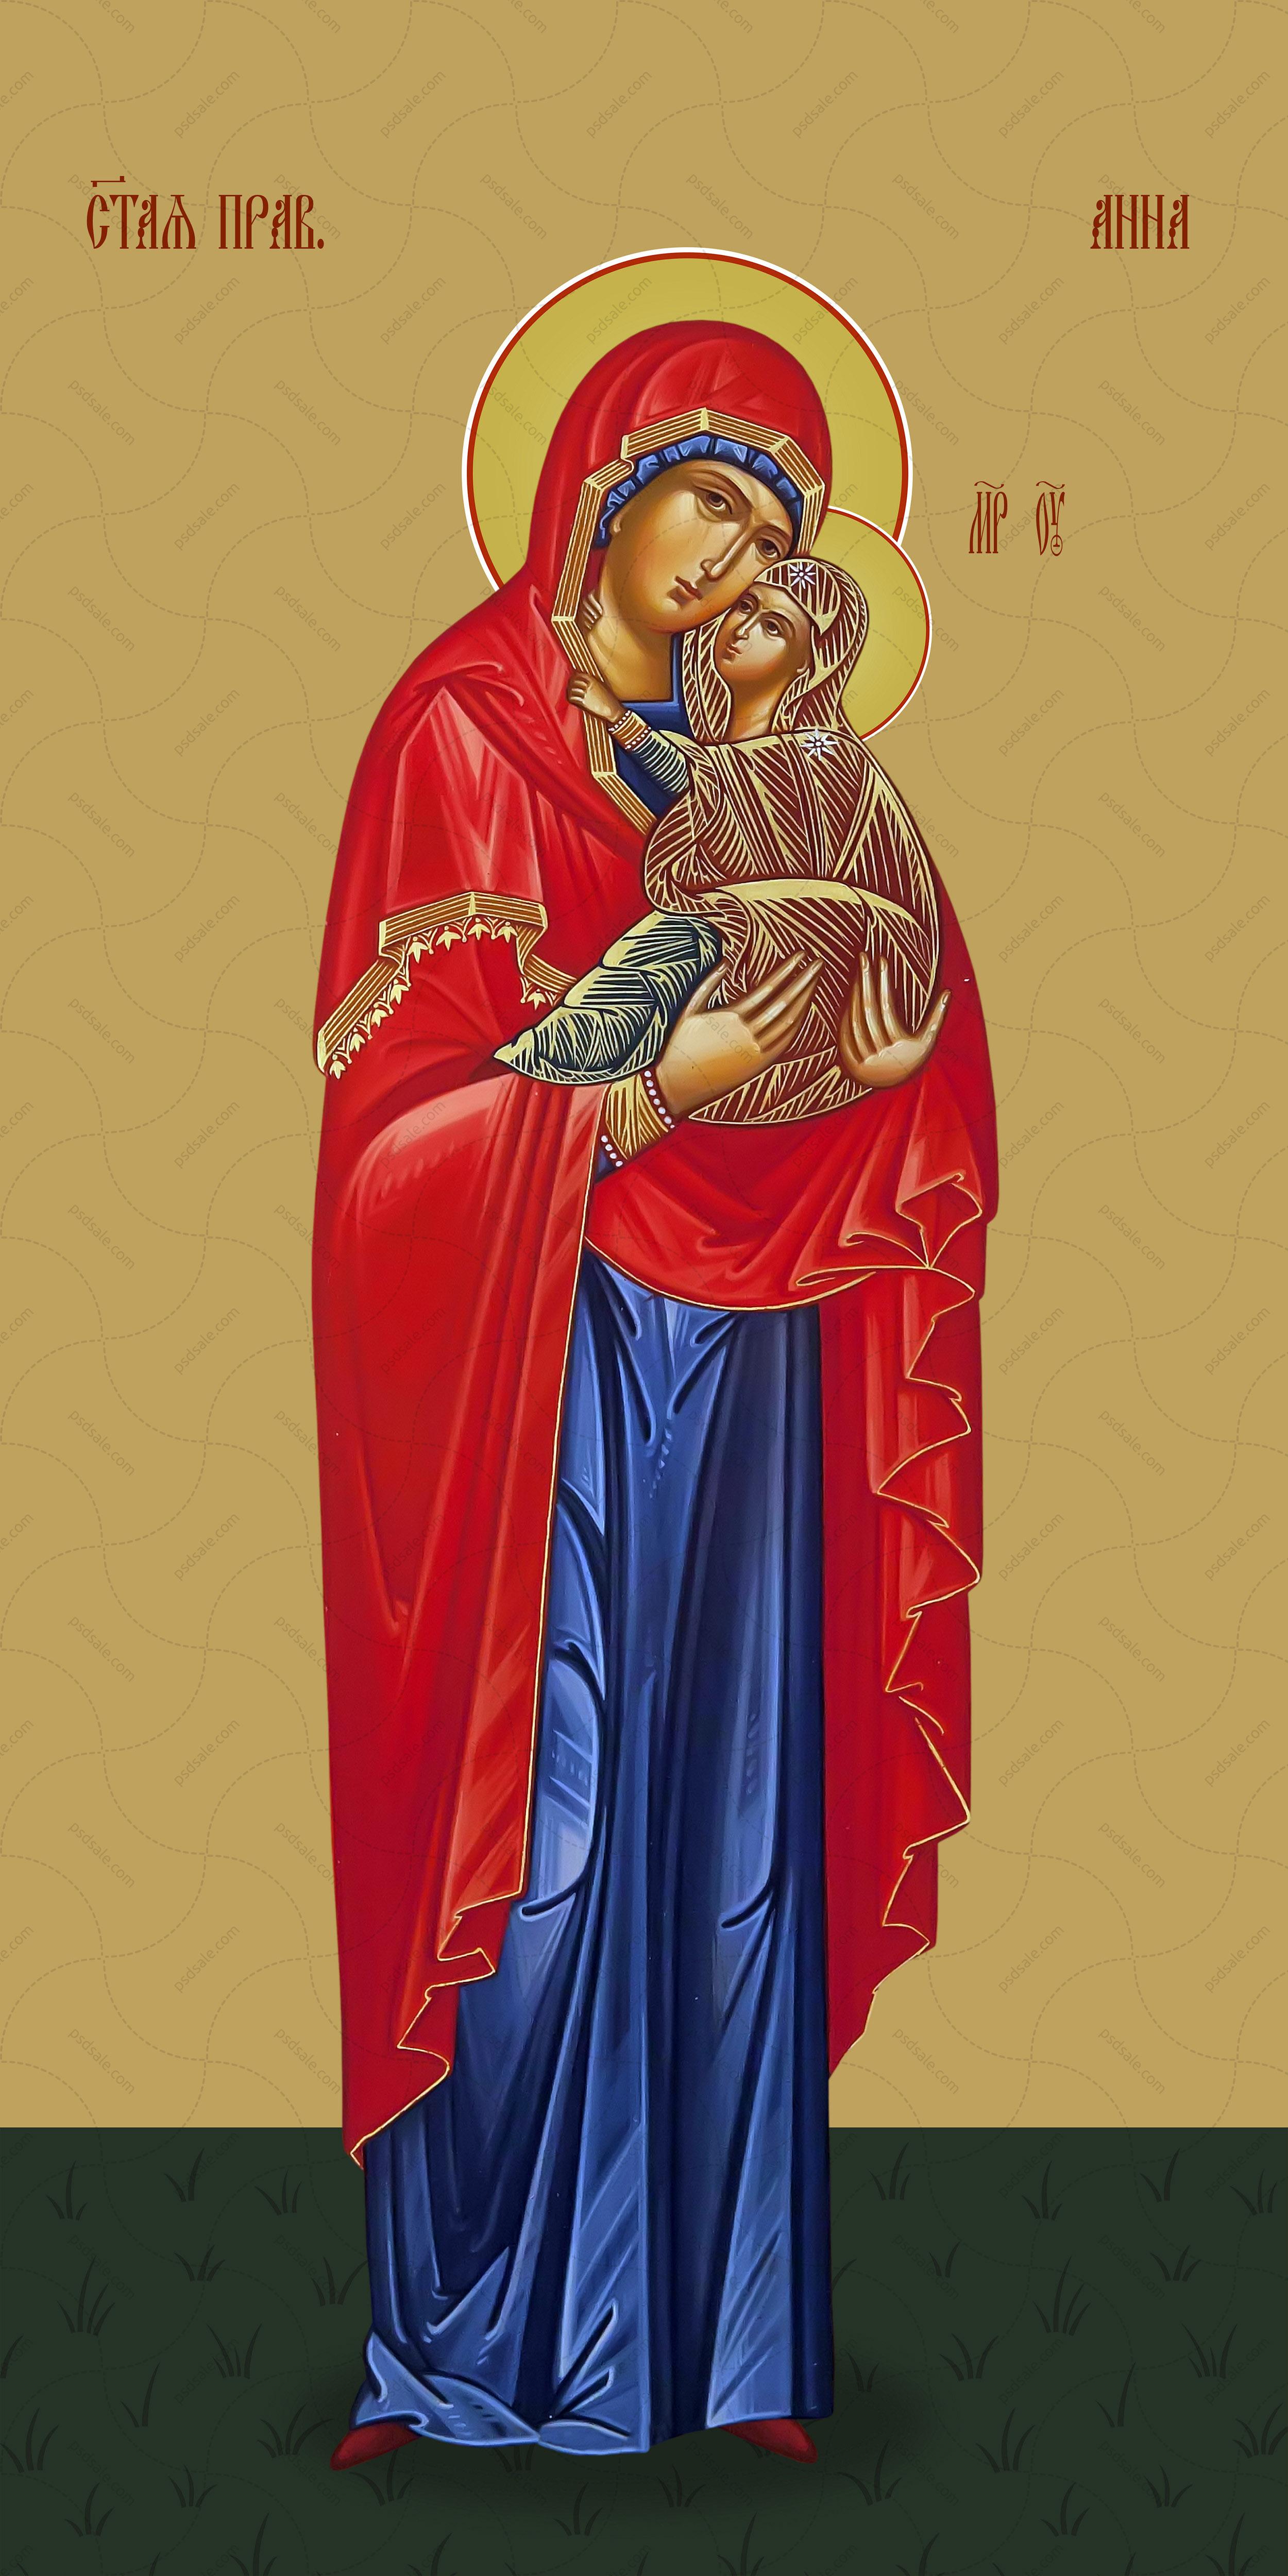 Мерная икона, Анна Праведная, святая